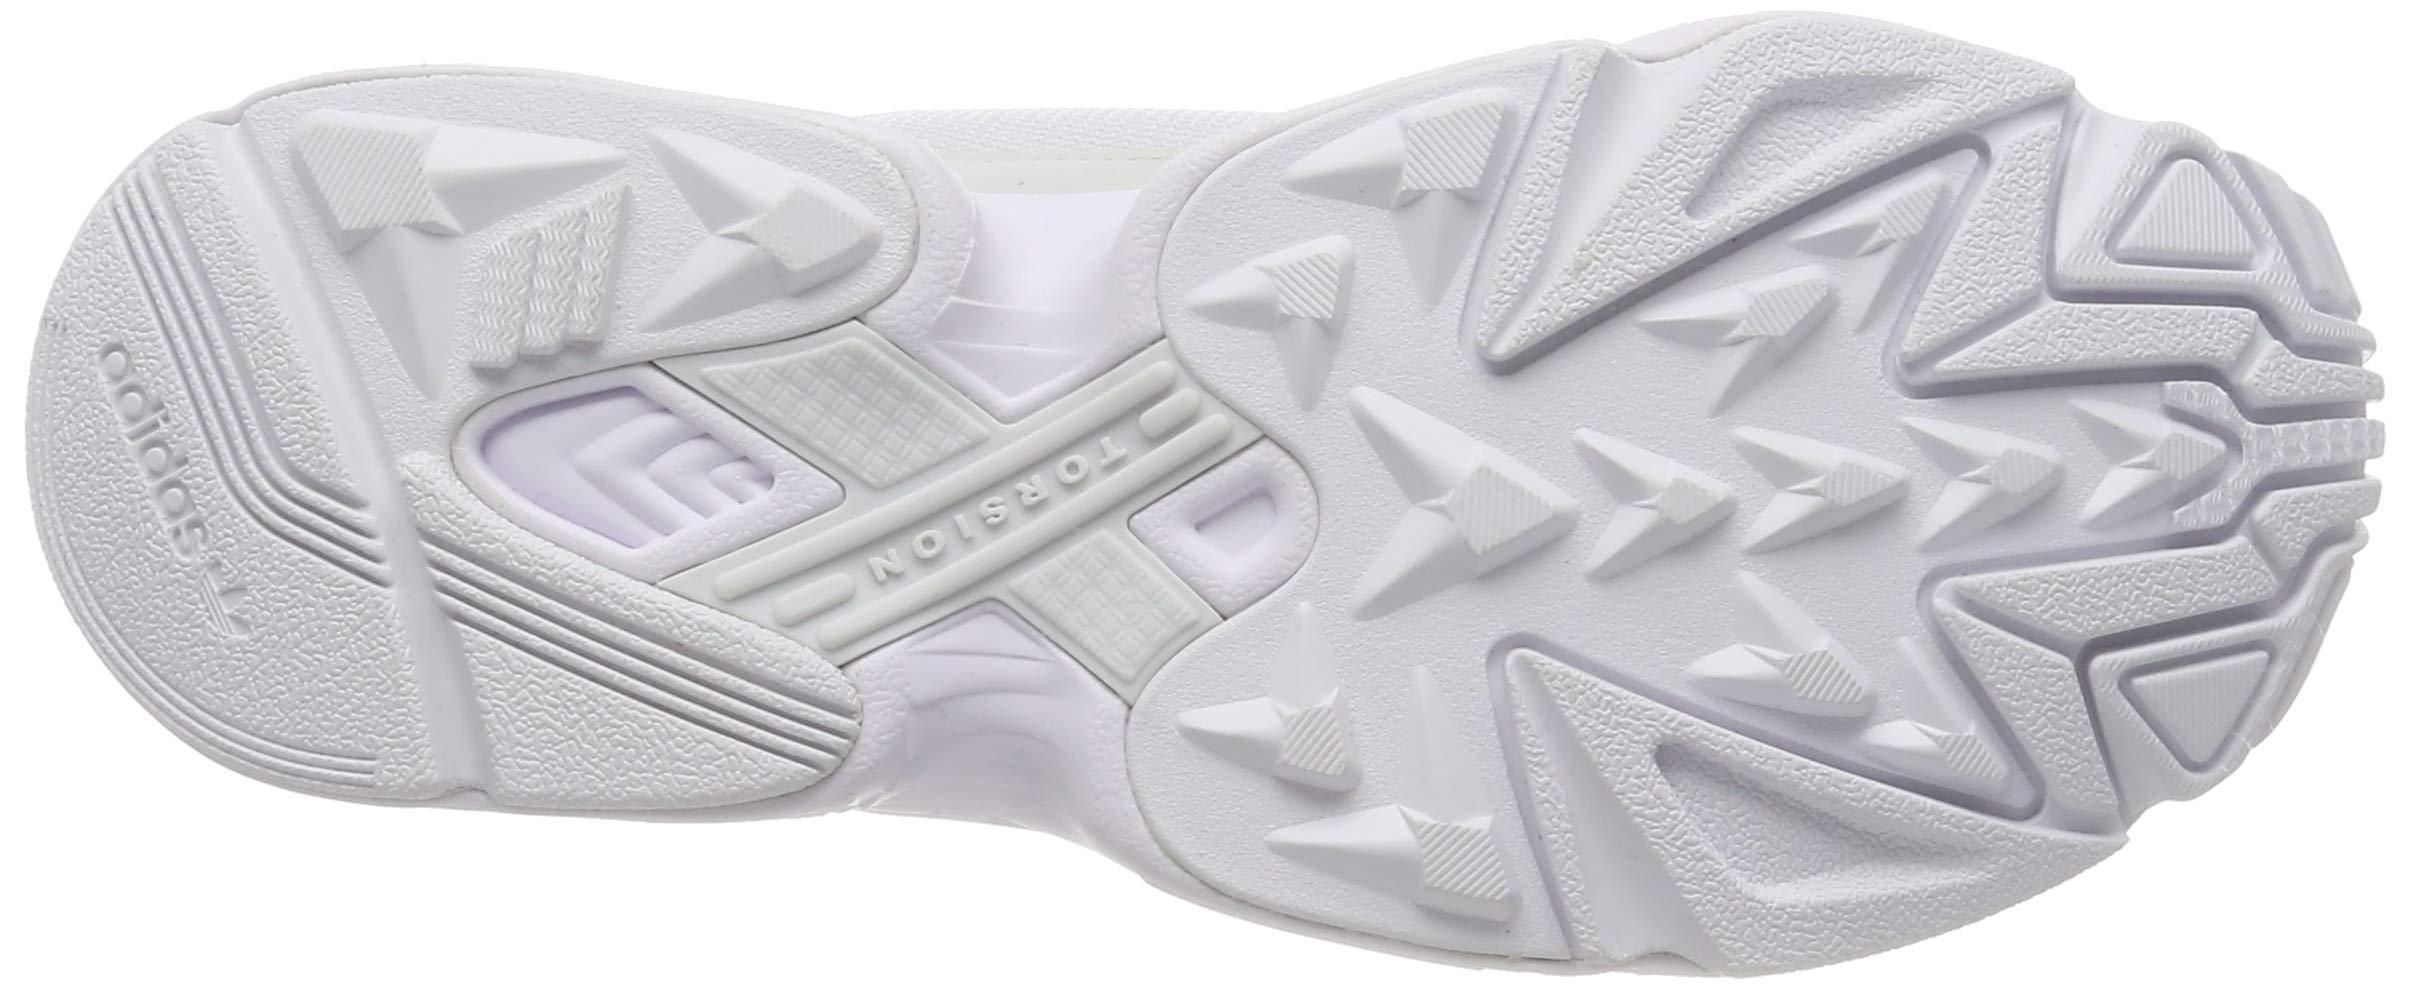 adidas Falcon Sh W, Scarpe da Ginnastica Donna, 0 3 spesavip